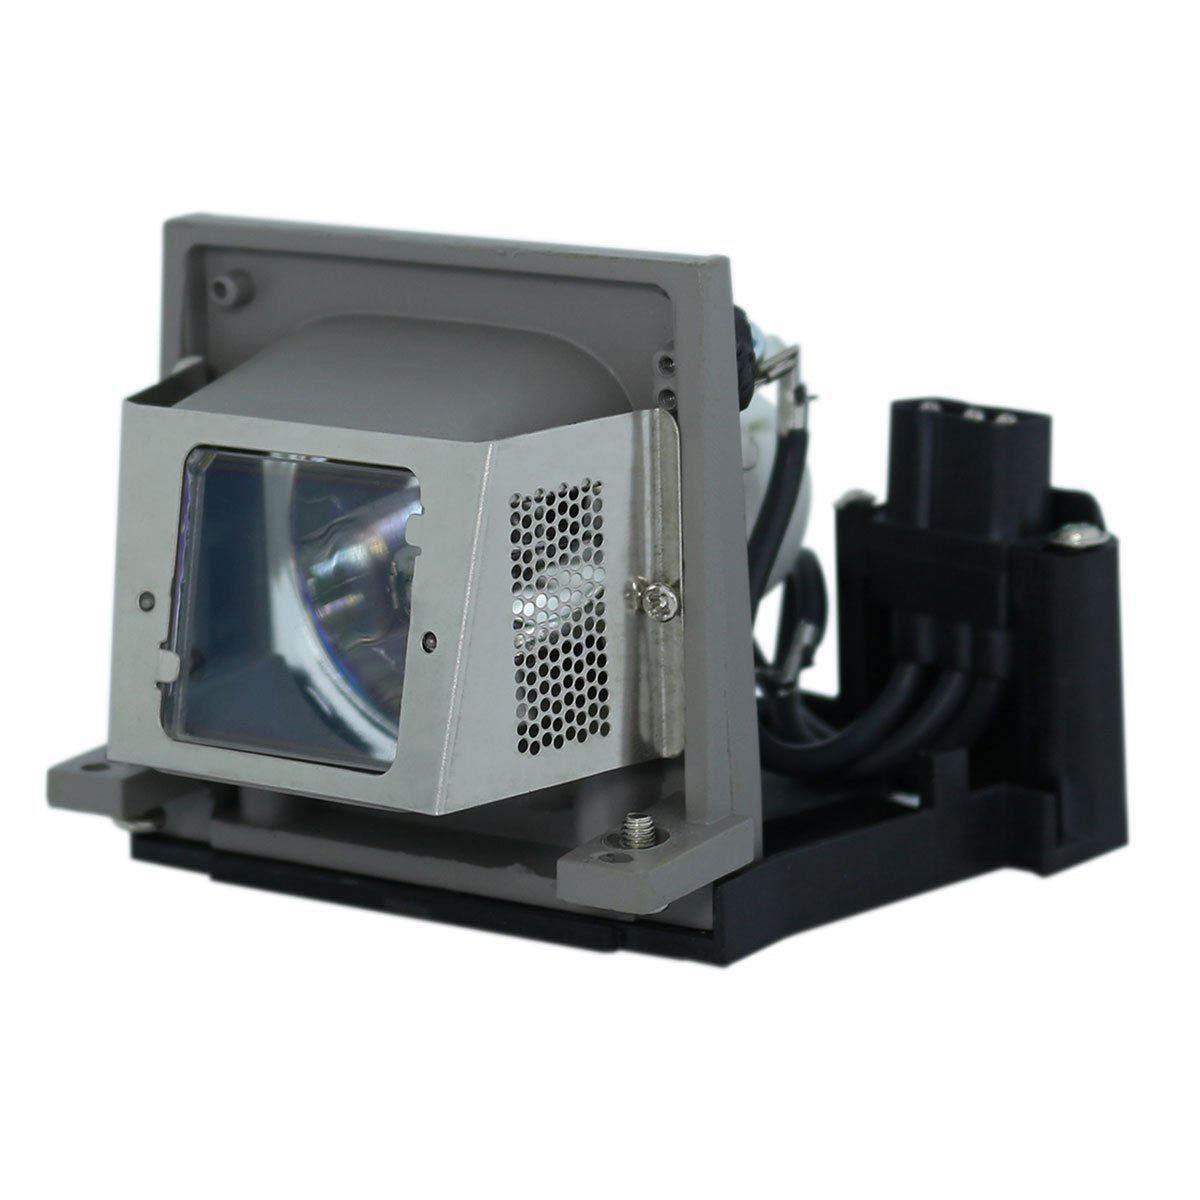 EachLight プロジェクター交換用 ランプ VLT-XD206LP(互換性のあるランプ) 三菱 Mitsubishi LVP-XD206/ LVP-SD206 対応[180日保証] B07K7HLWZS